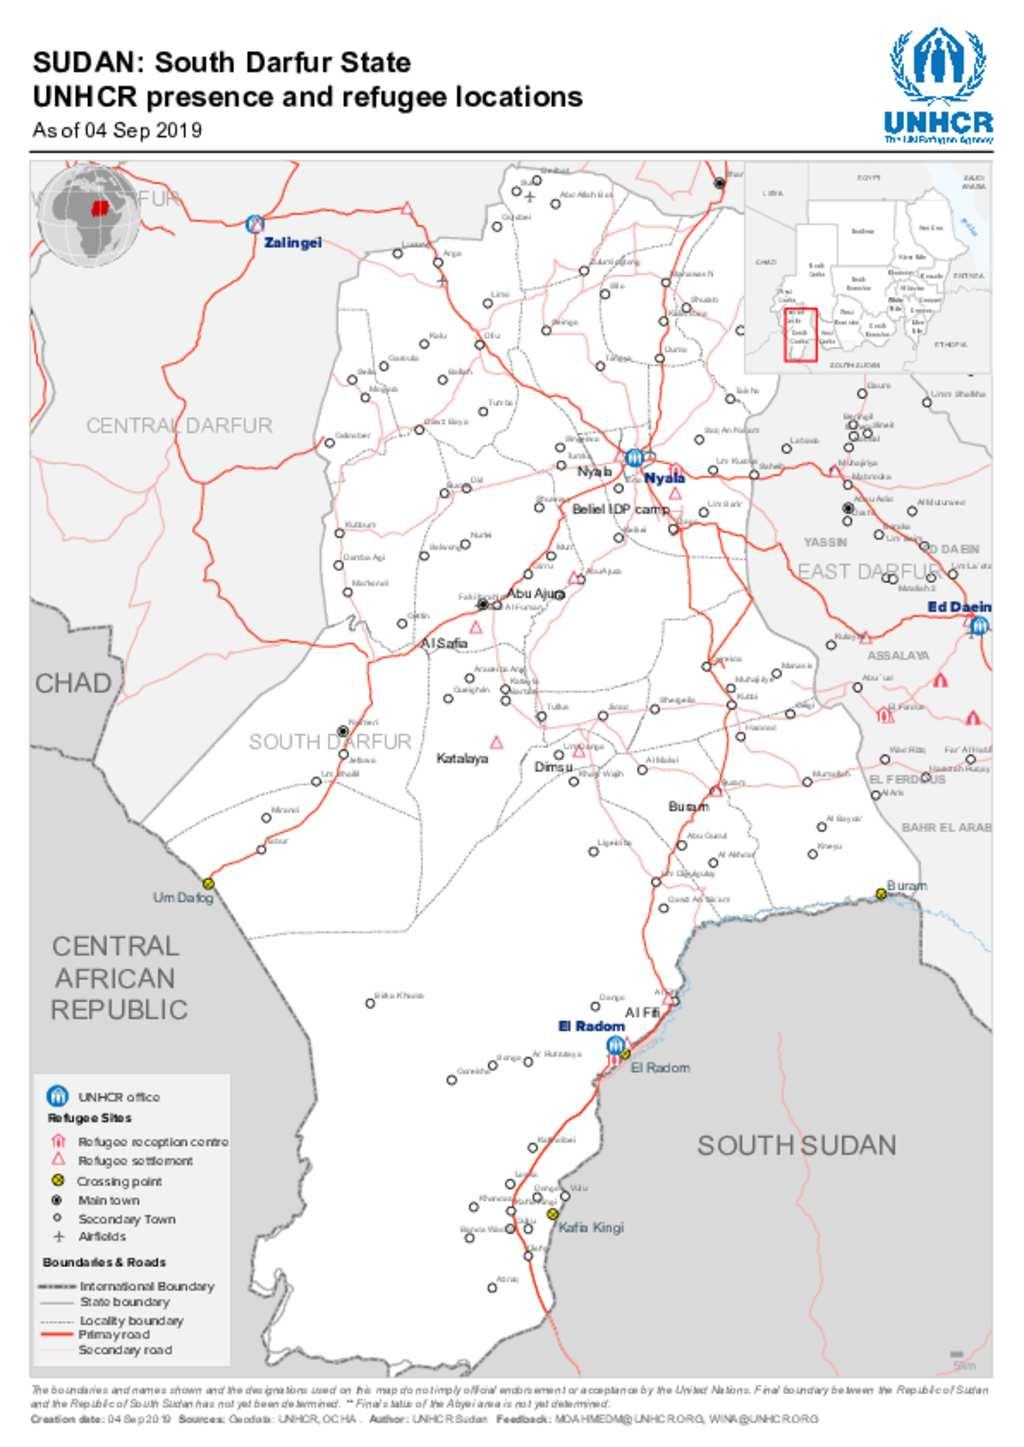 Doent - UNHCR SUDAN - South Darfur State on darfur world map, afghanistan map, darfur genocide, darfur today, darfur sudan country, darfur sudan flag, darfur village, darfur tribes, south sudan, china texas map, equality alabama map, darfur on map, darfur africa map, darfur people, darfur war, darfur google, victoria falls africa map, el fasher darfur map, darfur sudan food, darfur rebels, iran map,